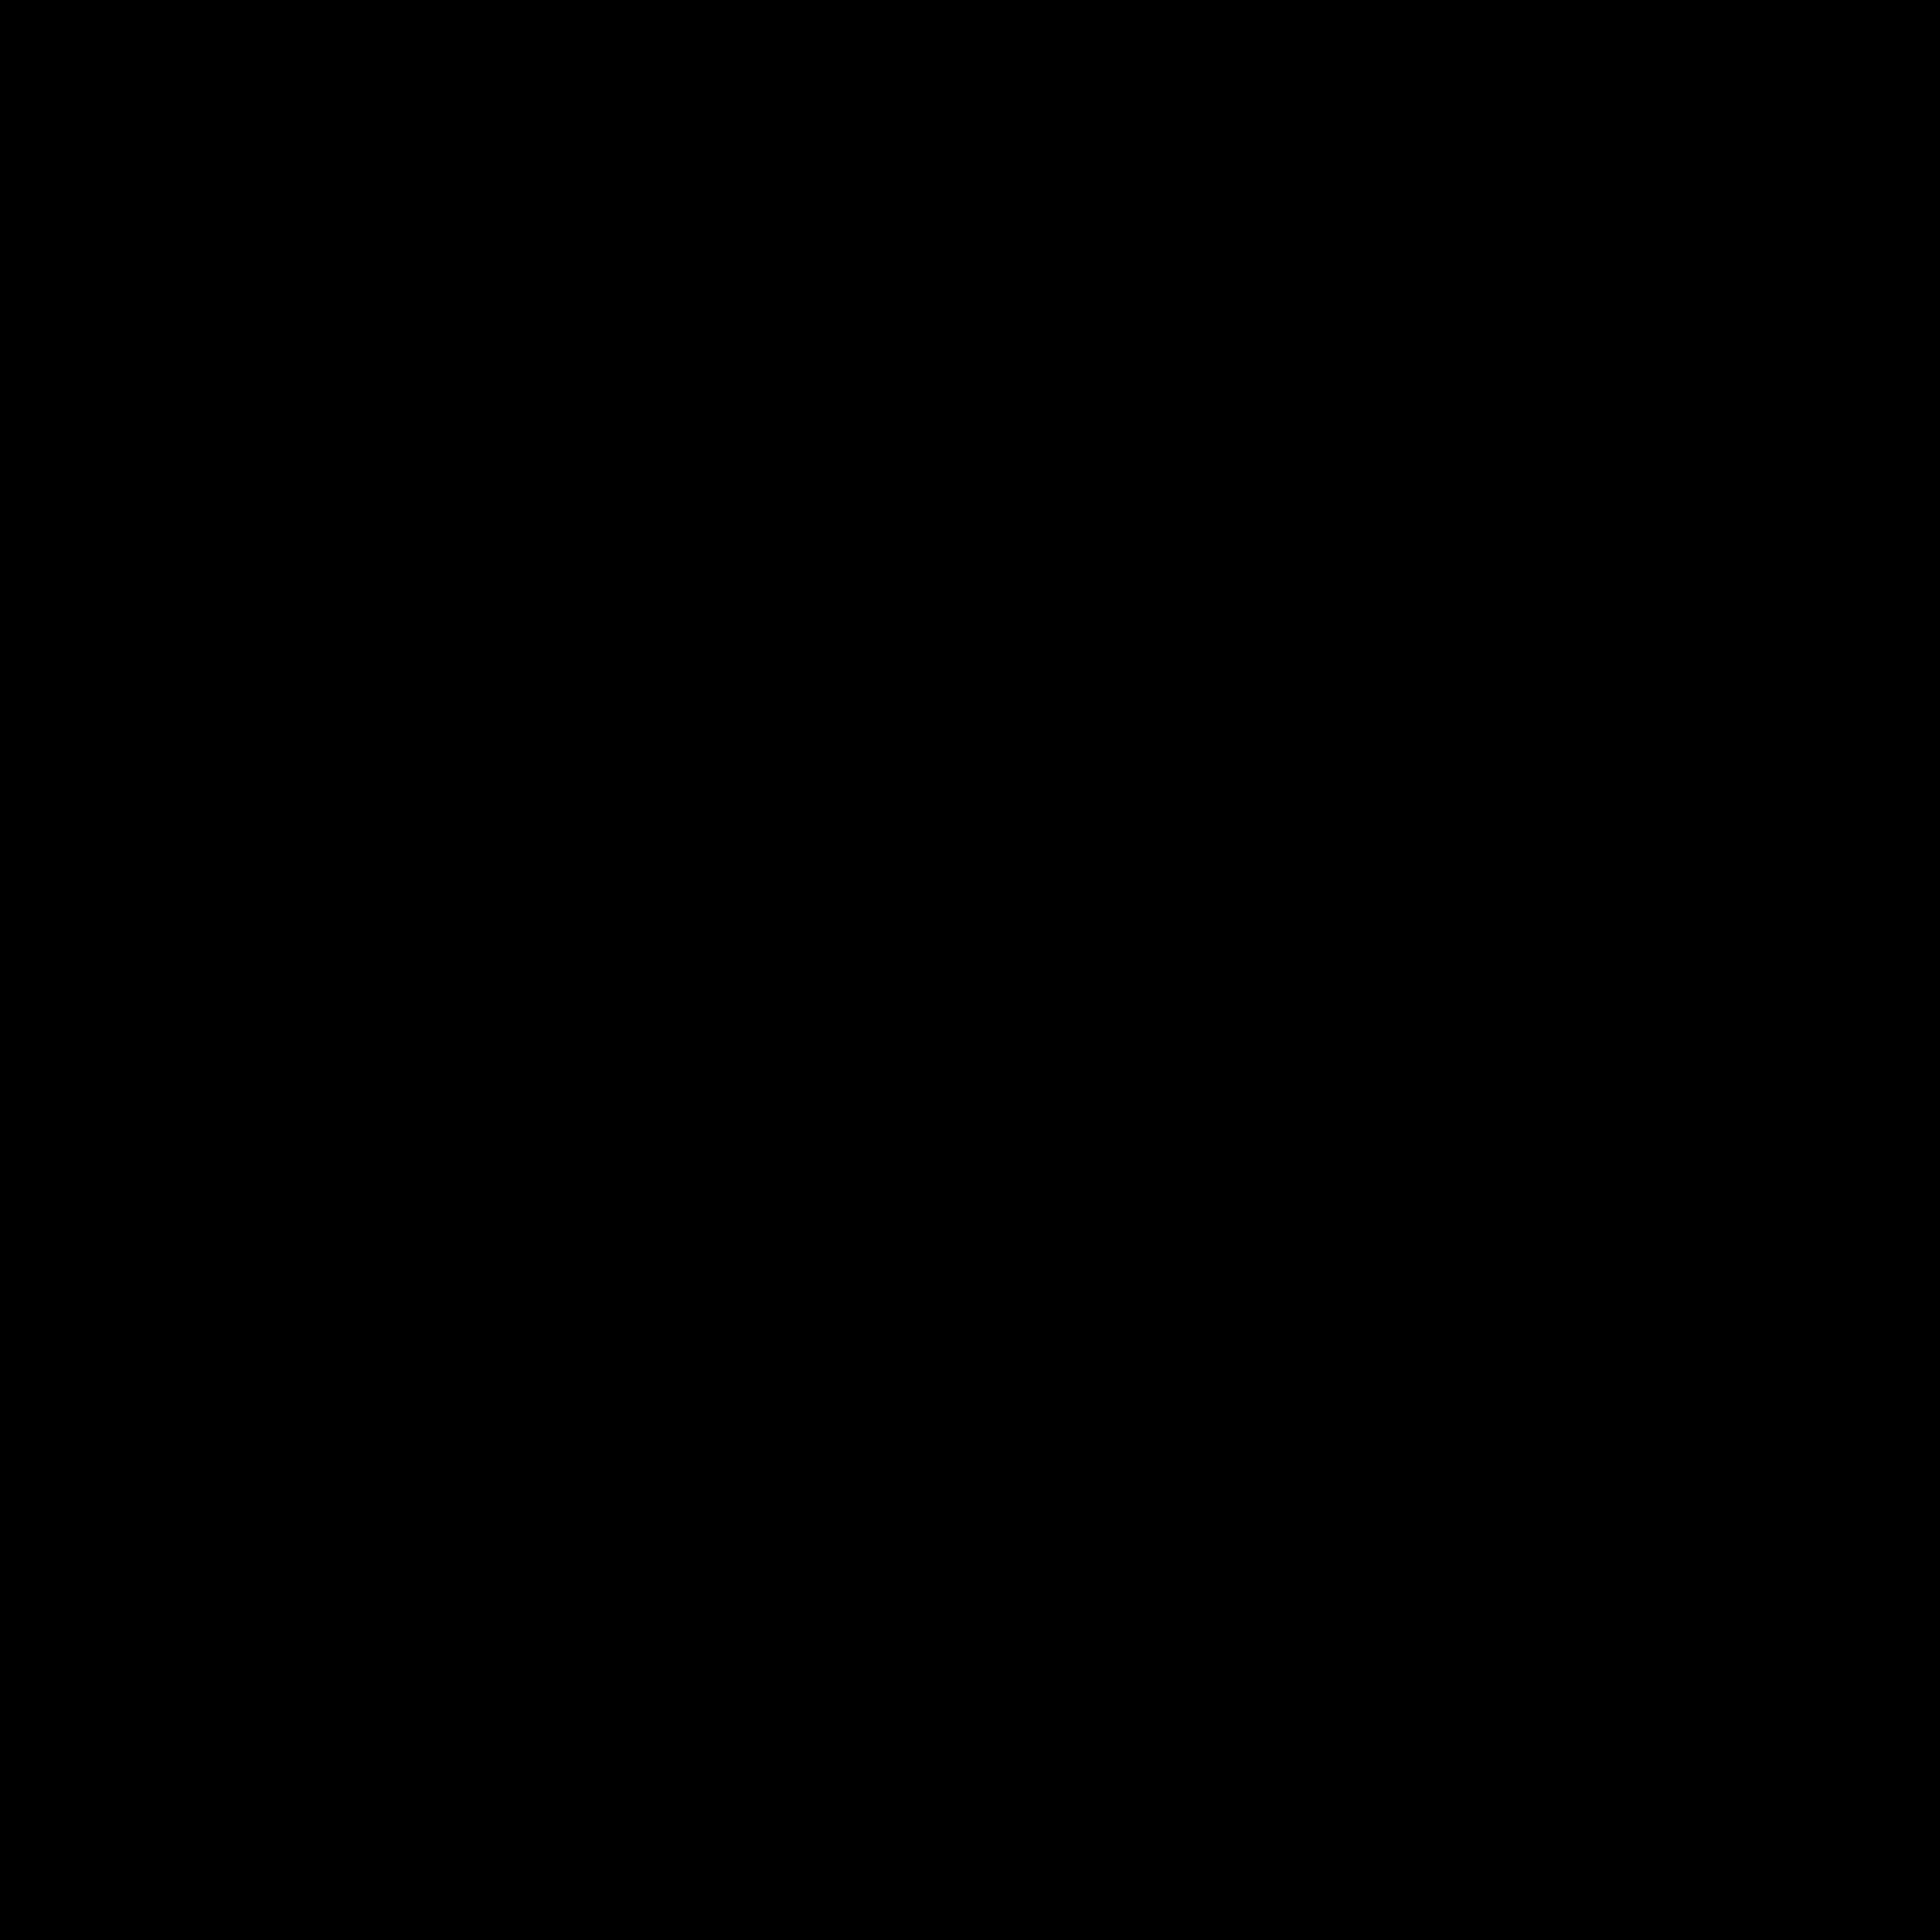 Ornamental cross clipart jpg stock Clipart - Ornamental cross 13 jpg stock